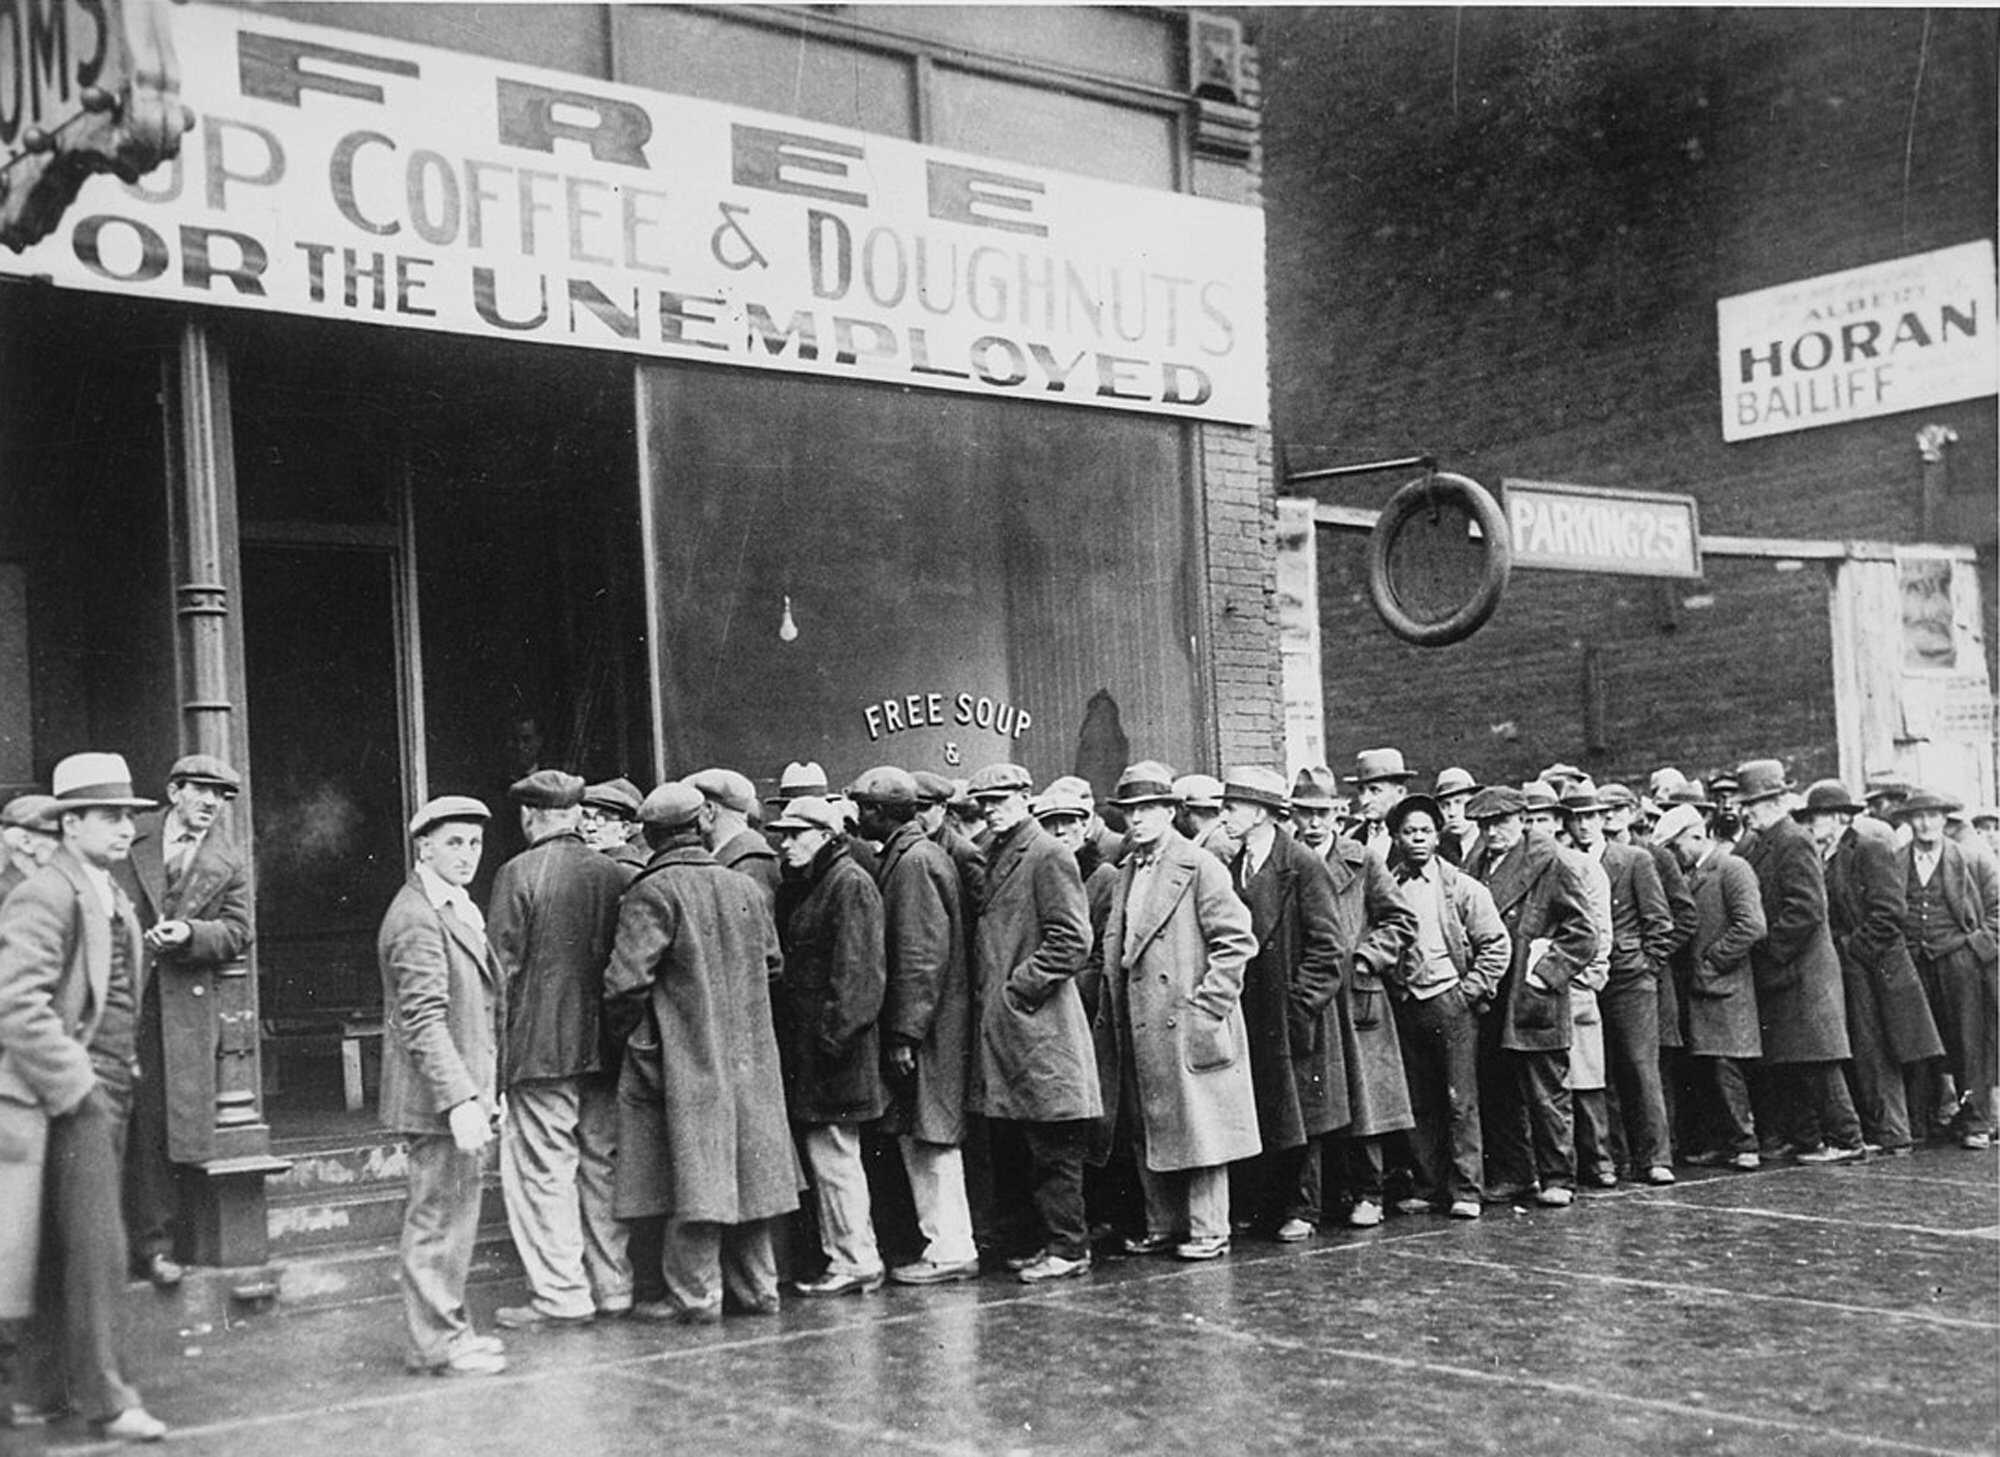 Dustbowl_Unemployed_men_queued_outside_a_depression_soup_kitchen_1931_-_NARA.jpg